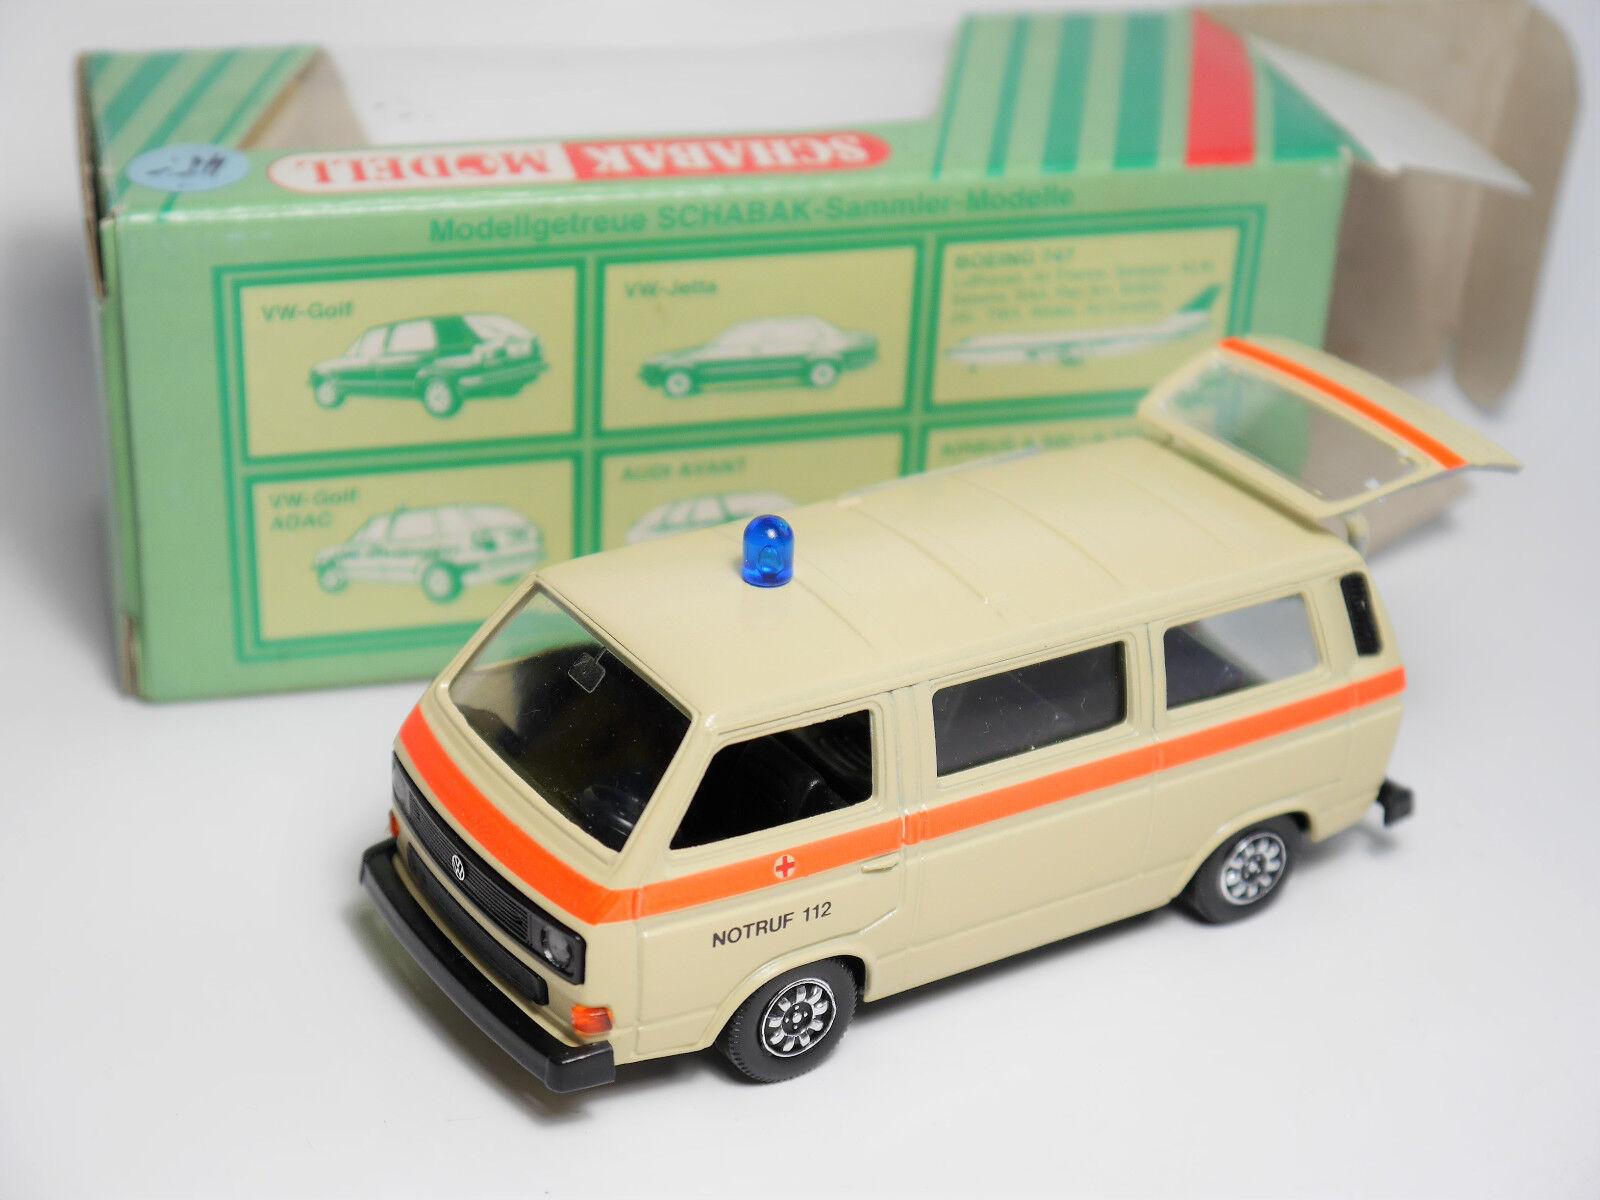 VW Kombi bus t3 T 3 Caravelle Syncro DRC RTW  Emergency 112 , Schabak 1 43 Boxed a